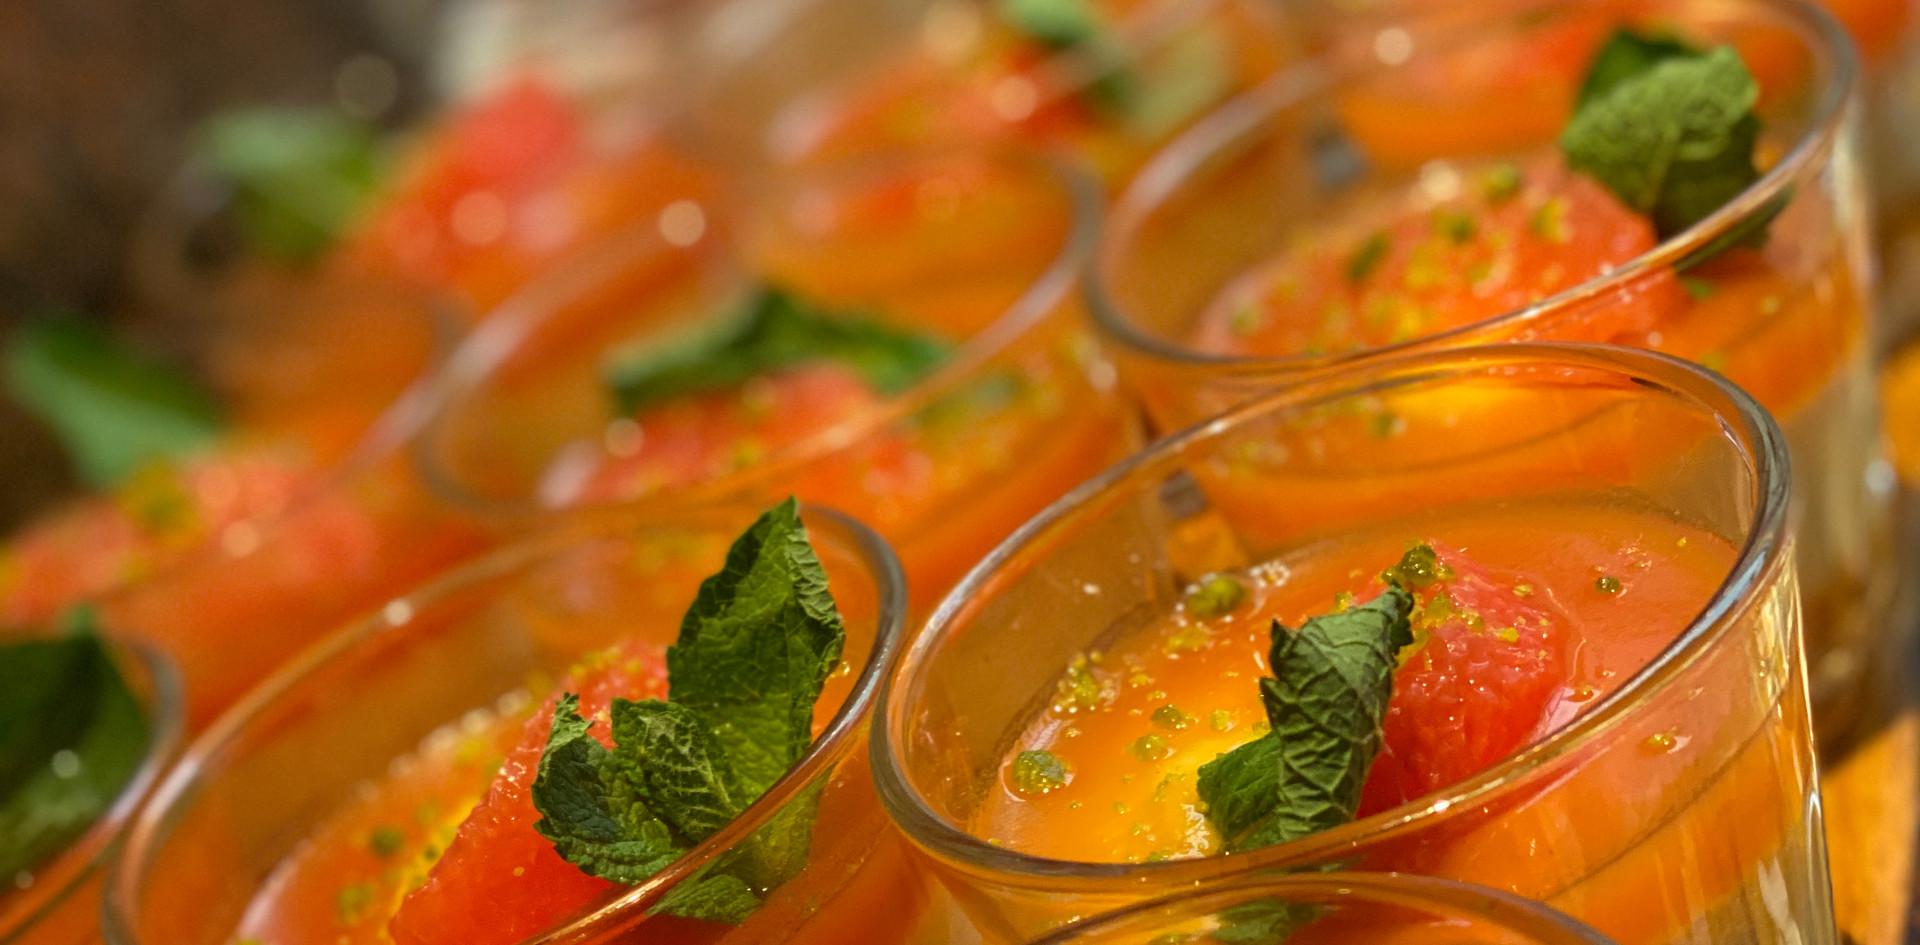 Dessert Lunch & Sweet - Hotel Wegner - The culinary Art Hotel